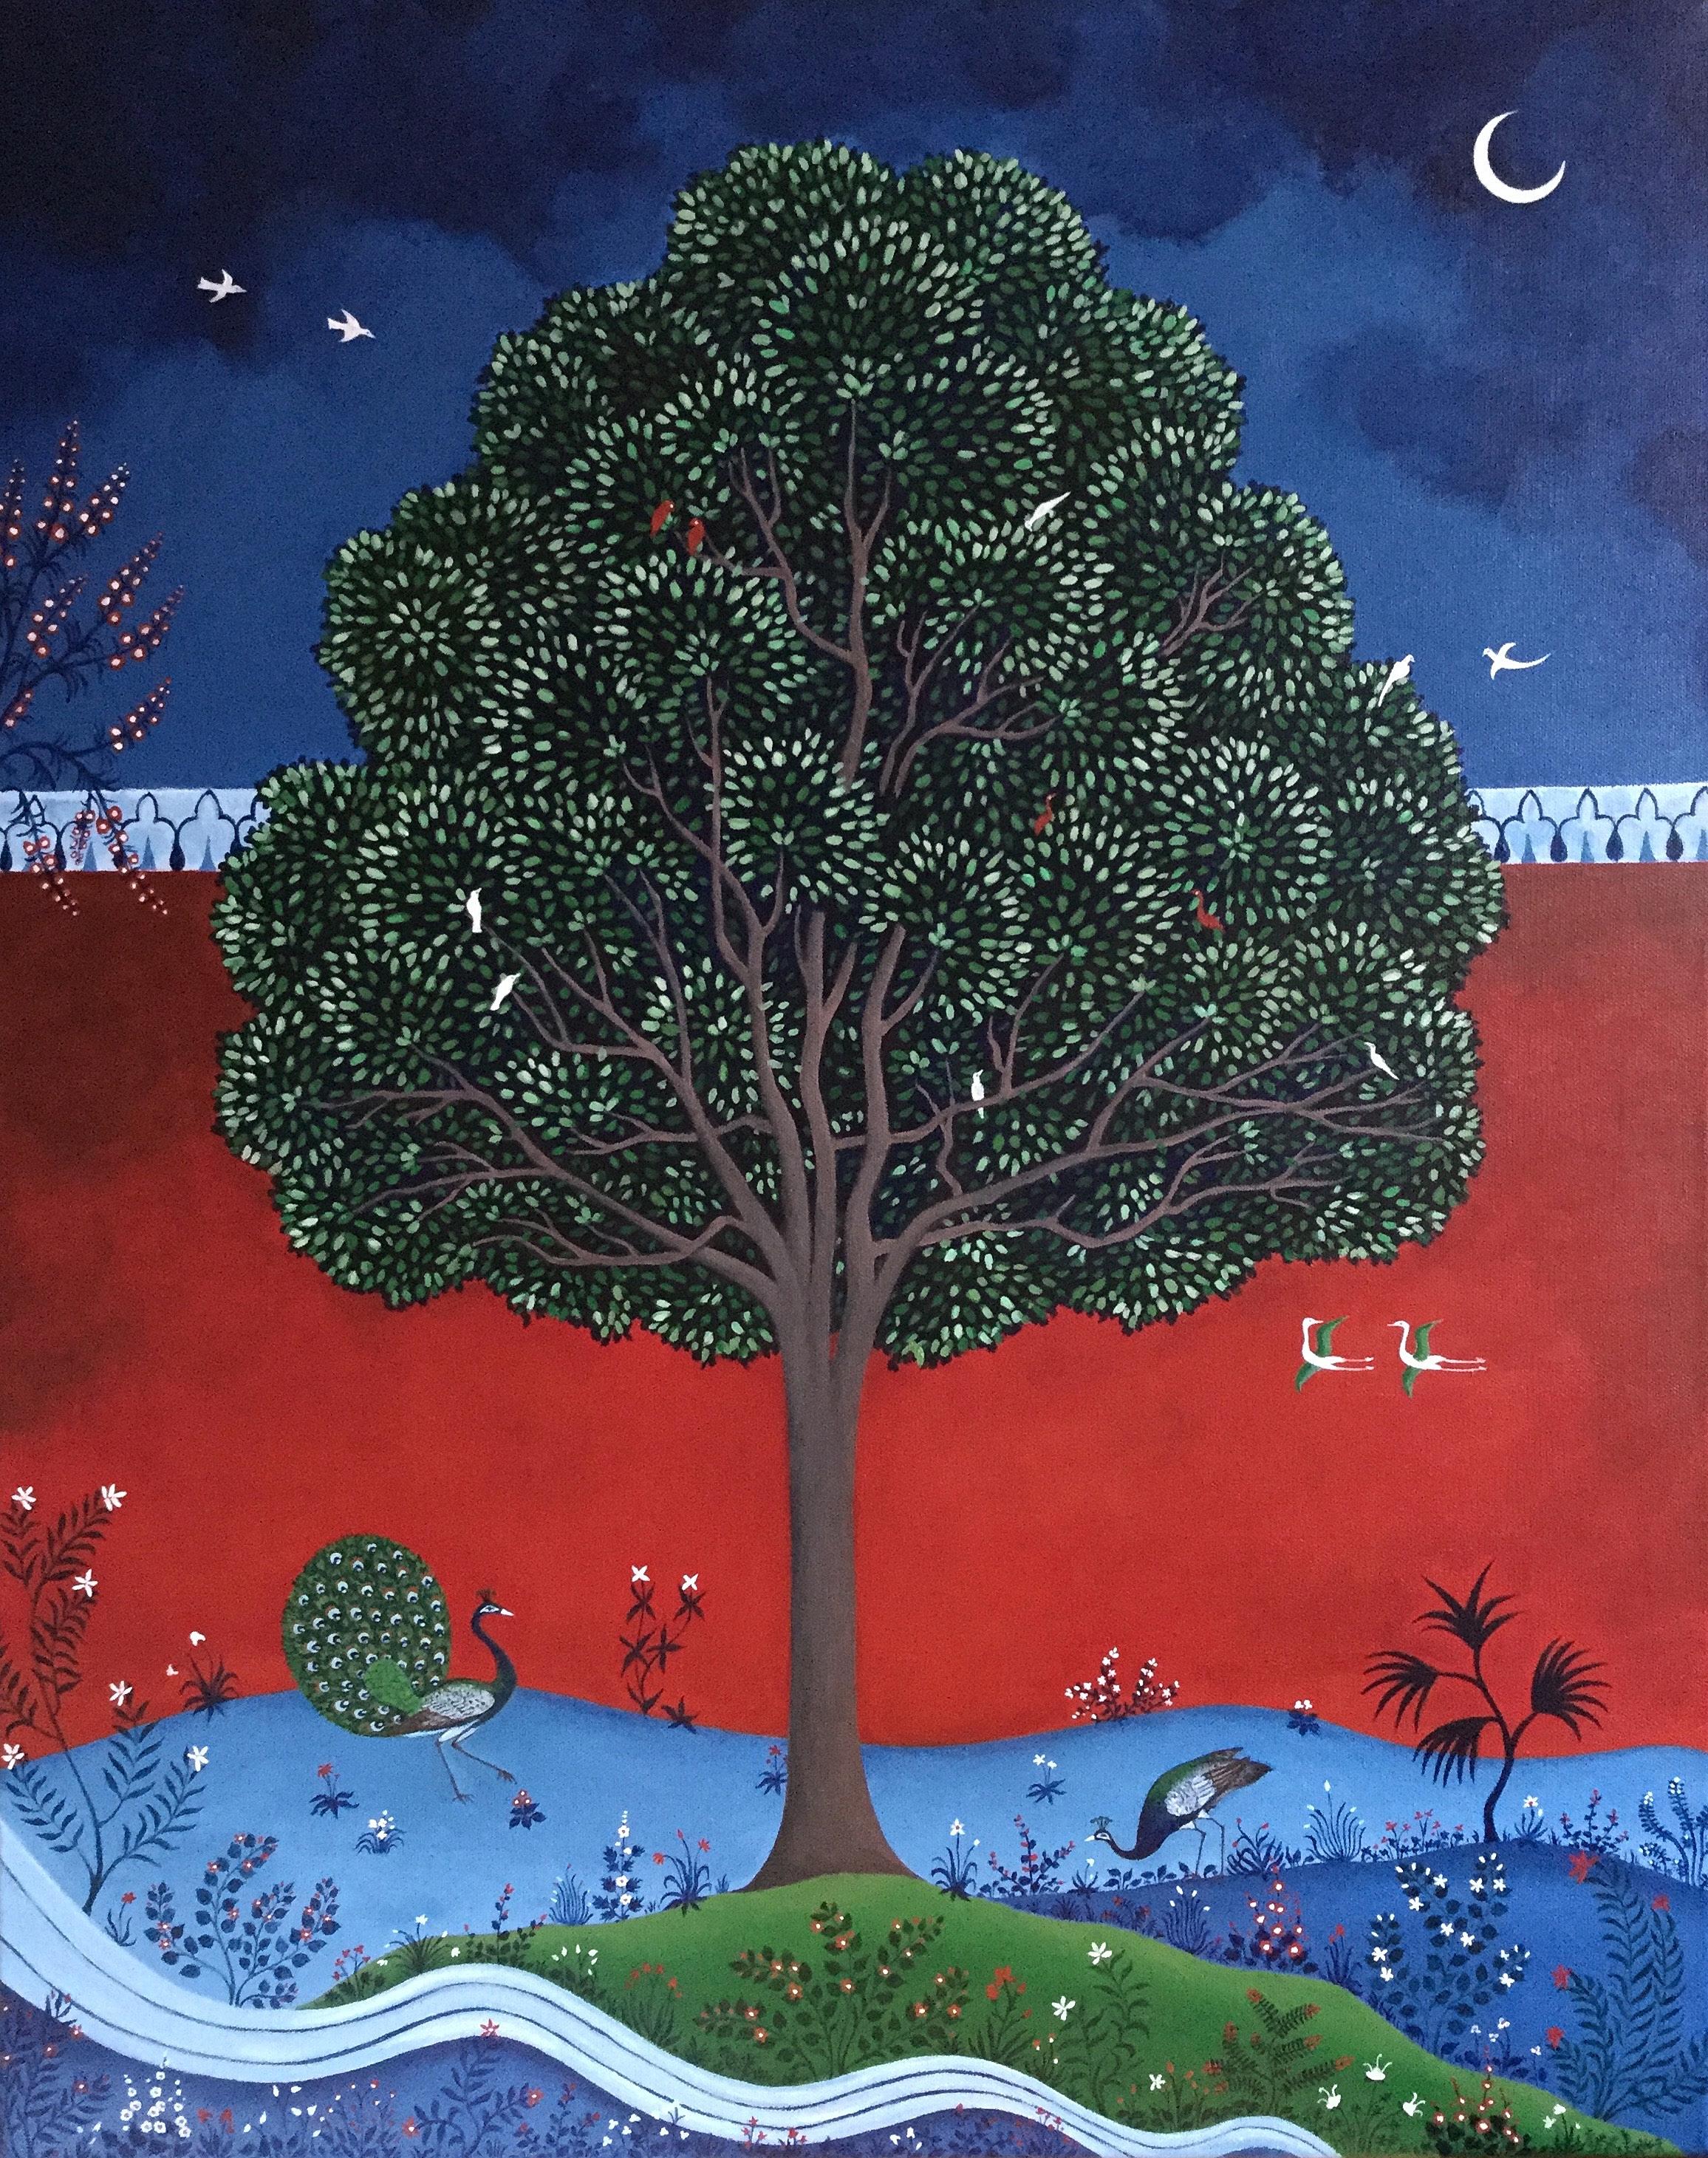 the red garden, 24''x30'', acrylic on canvas, 2017